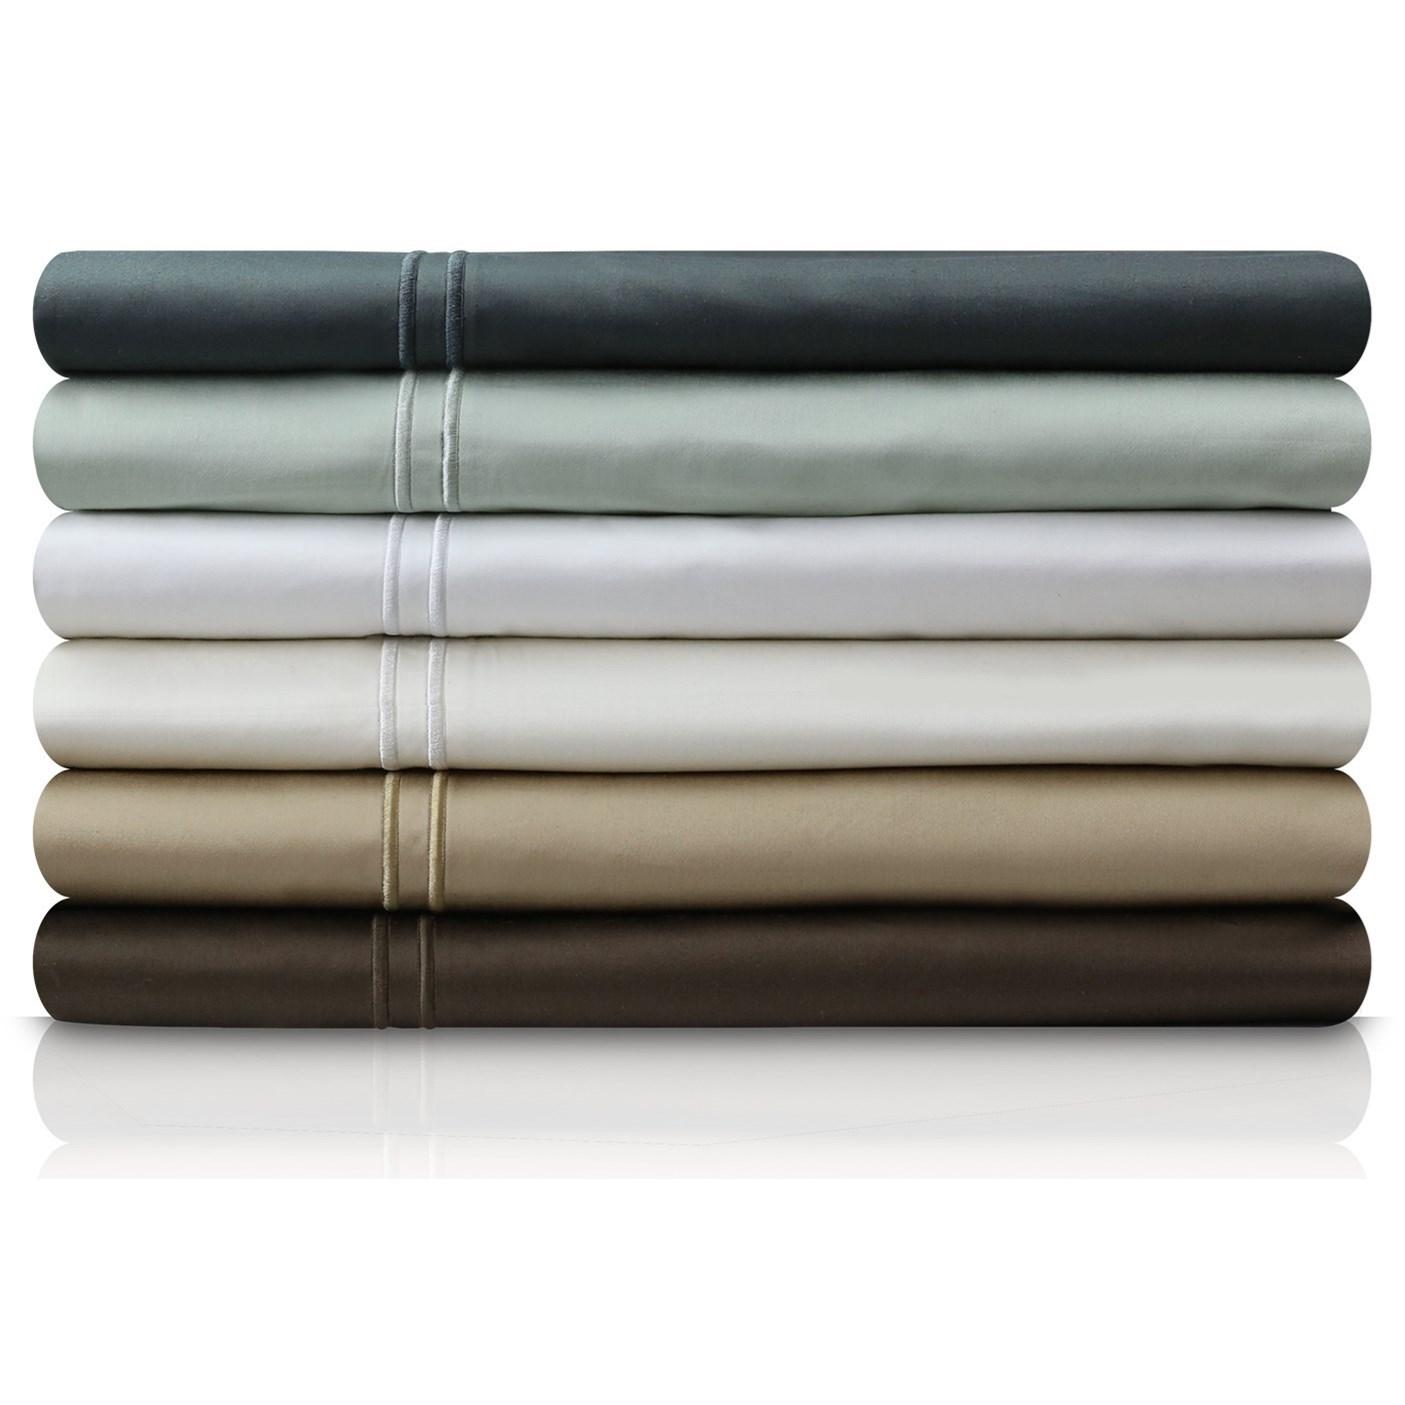 Malouf Egyptian Cotton Full 600 TC Egyptian Cotton Sheet Set - Item Number: MA06FFSISS